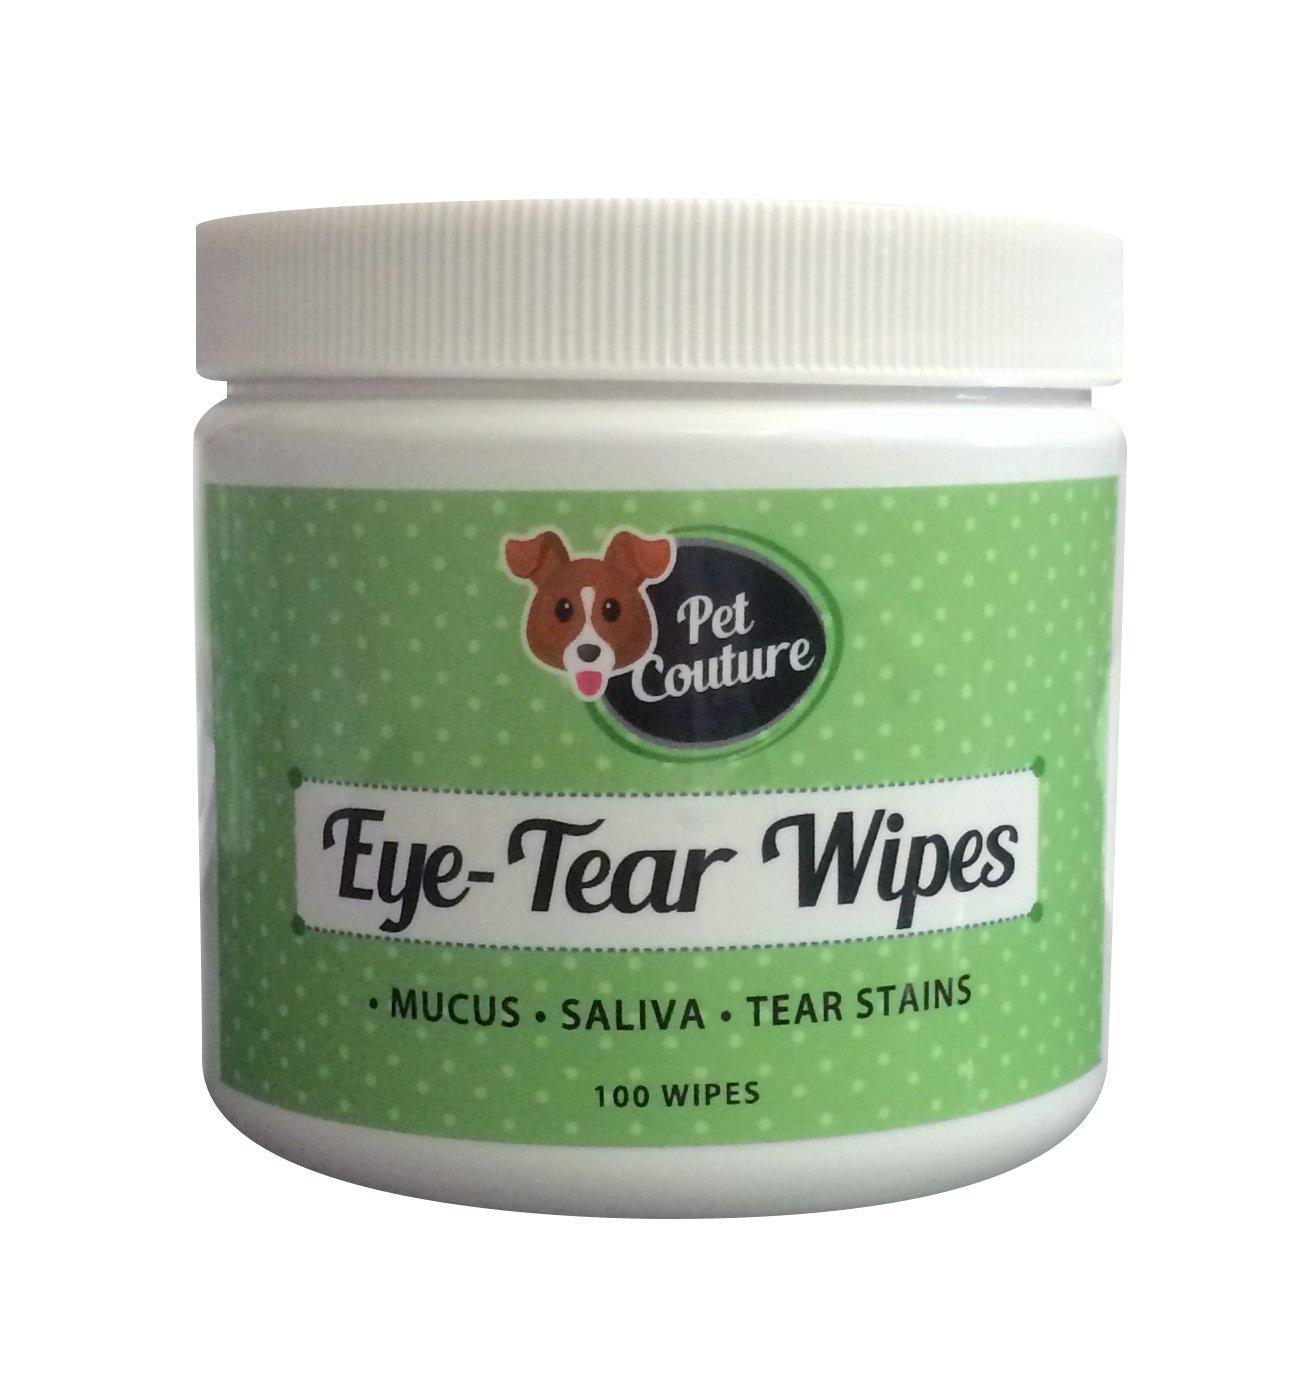 Eye Tear Wipes